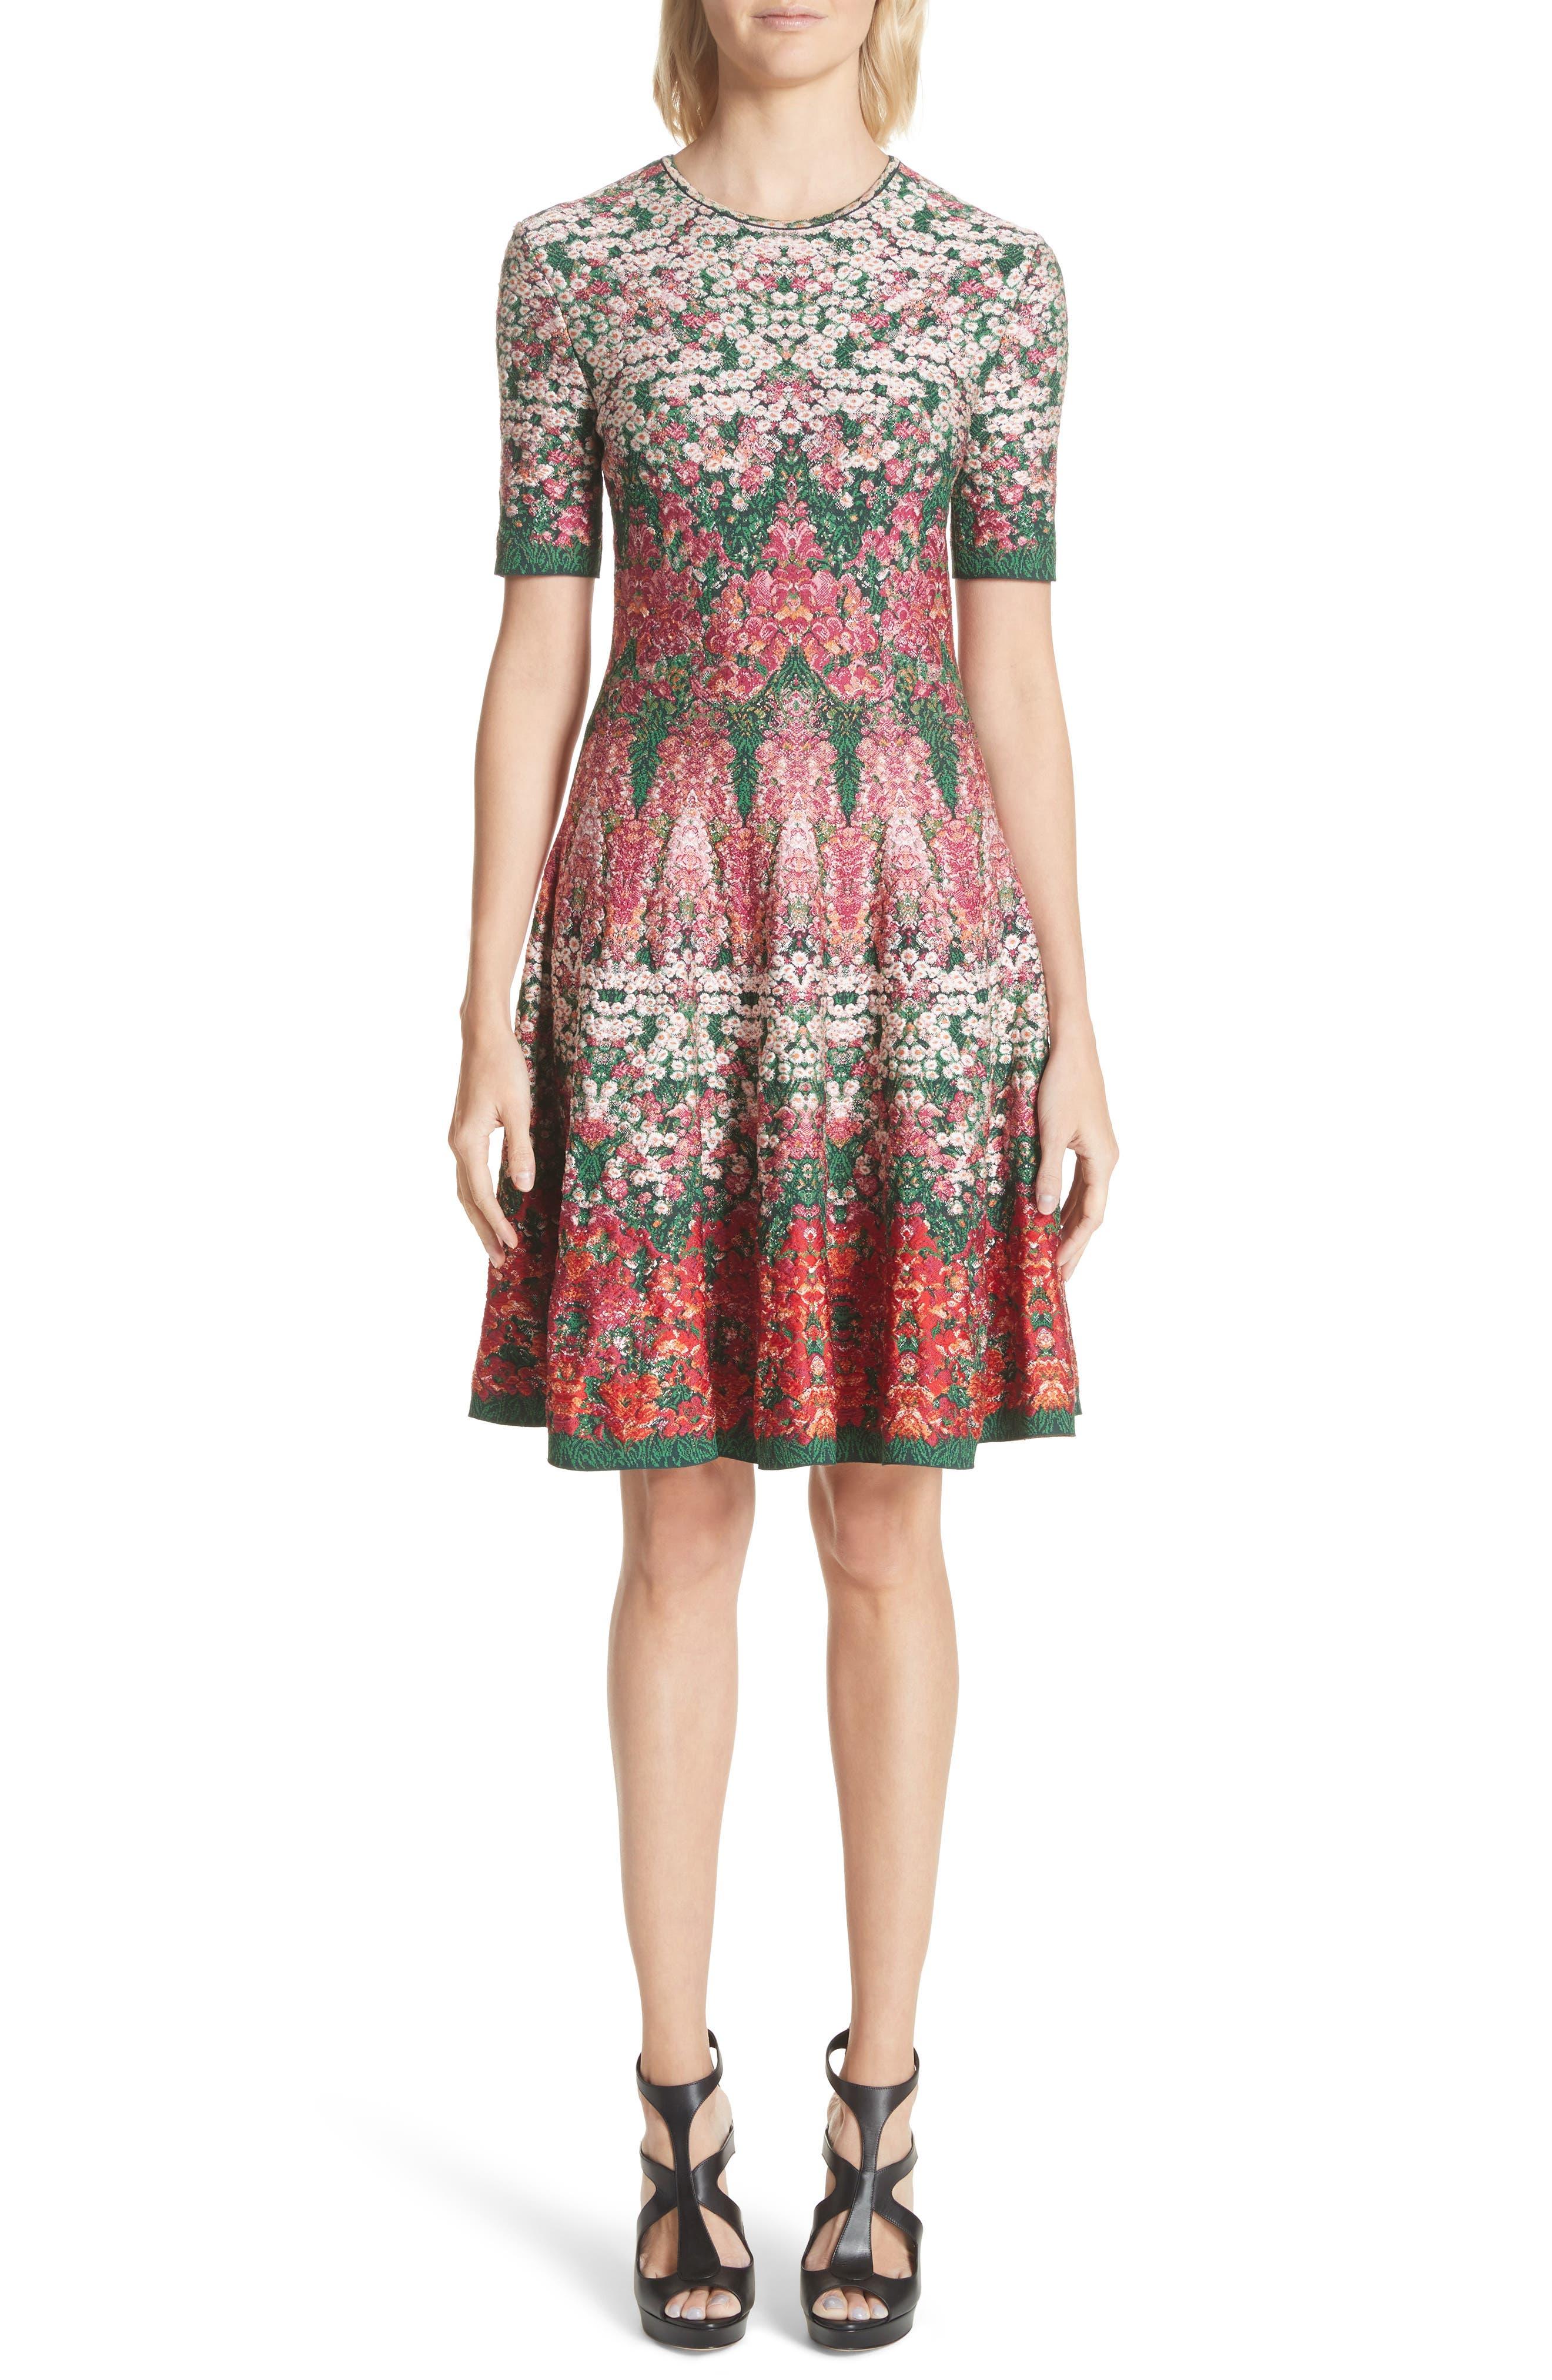 Alexander McQueen Floral Jacquard Knit Fit & Flare Dress